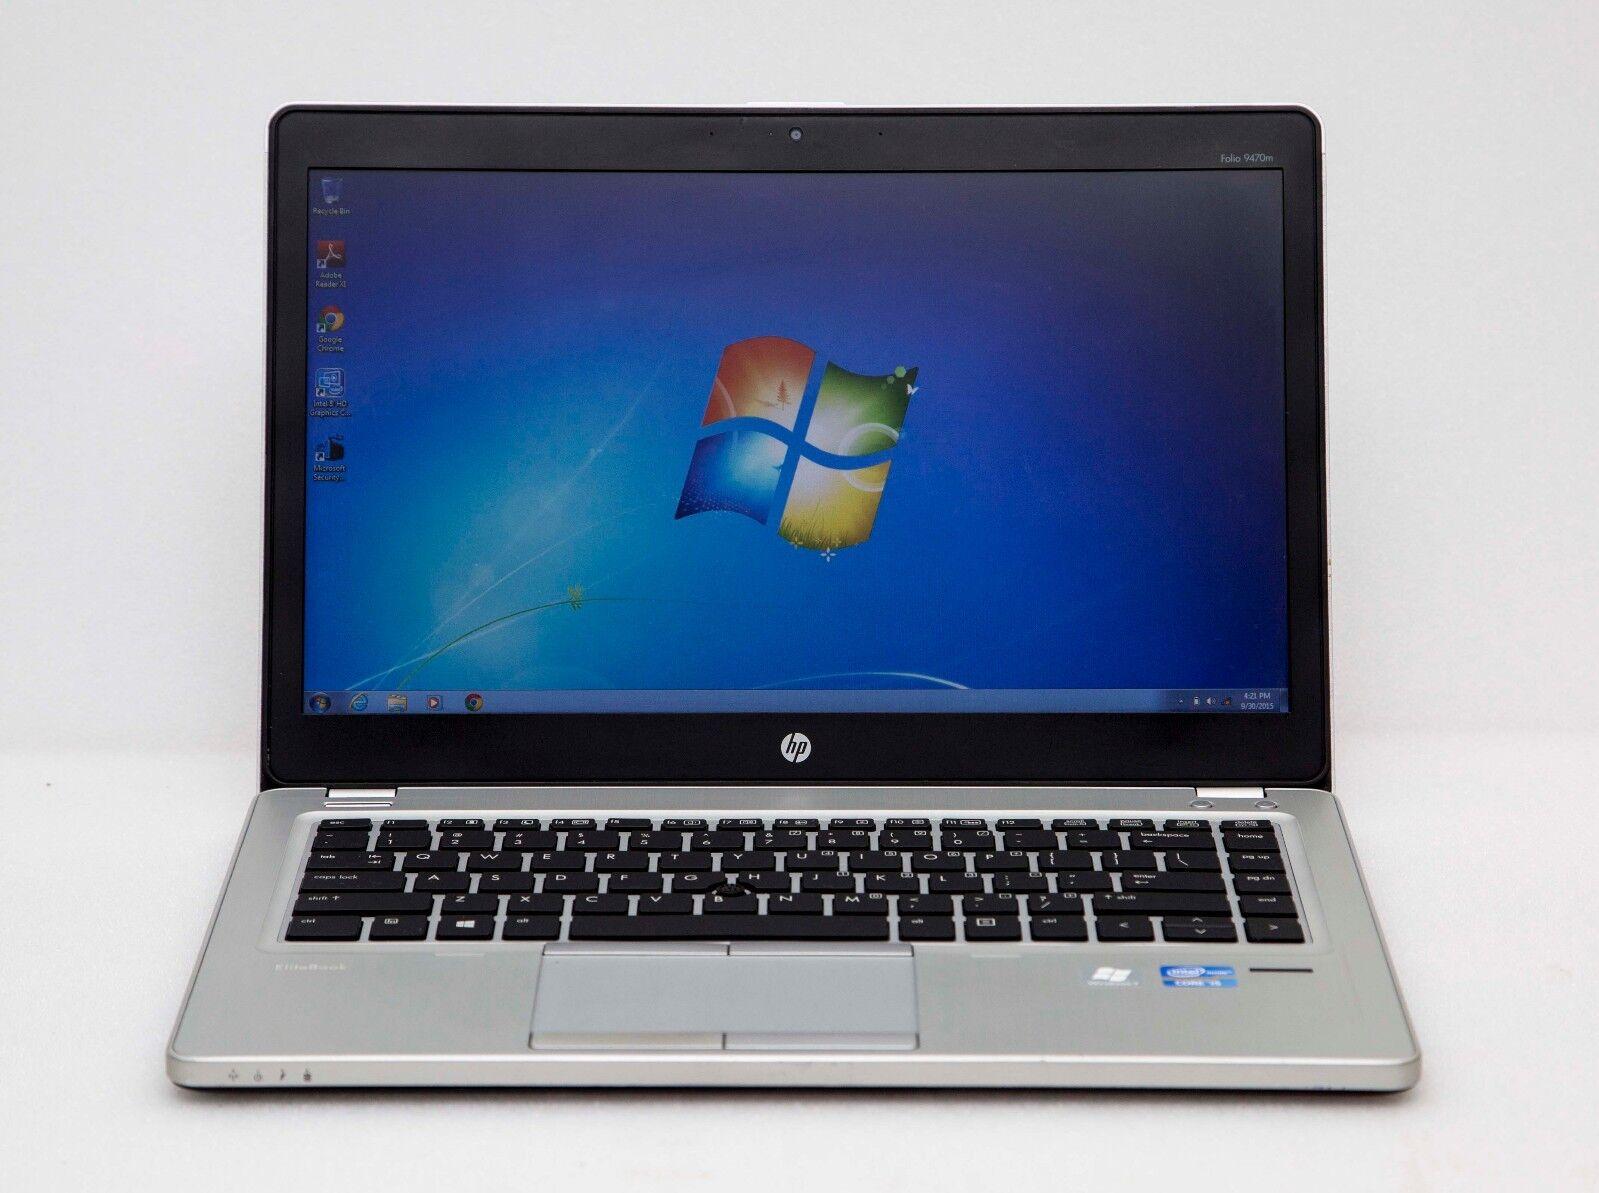 "HP Ultrabook Folio 9470m 14"" Core i5-3437u 1.9/4/320GB Wn7 Webcam Backlit Laptop"